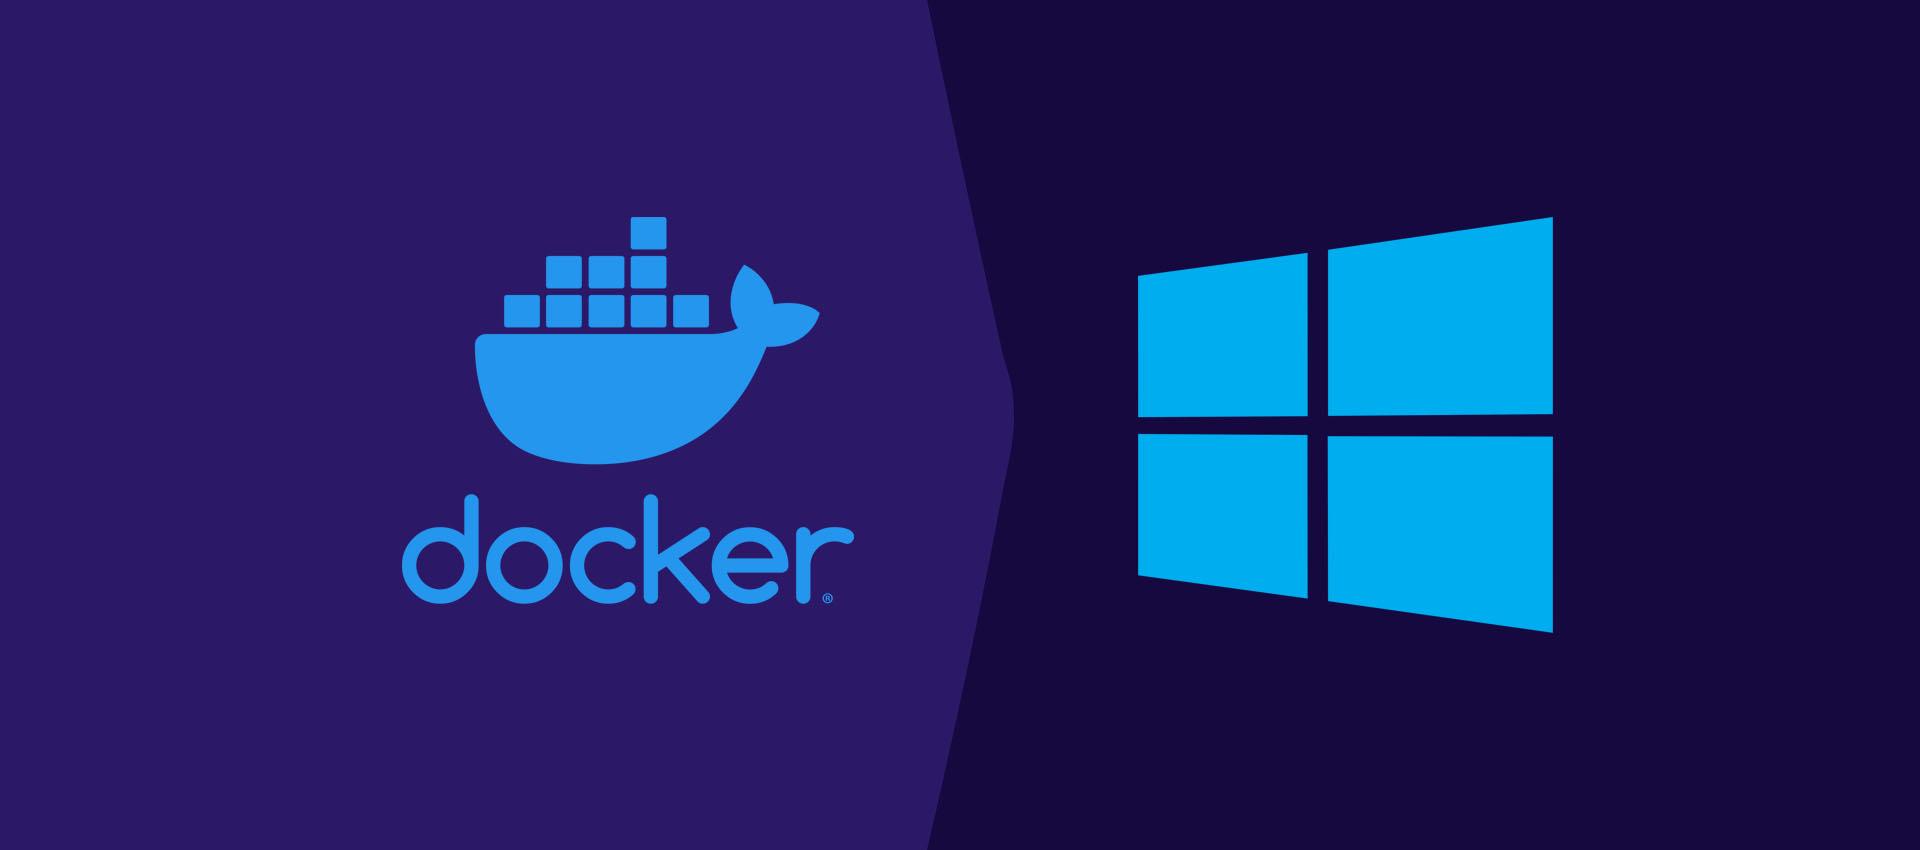 How To Change Docker Data Path On Windows 10